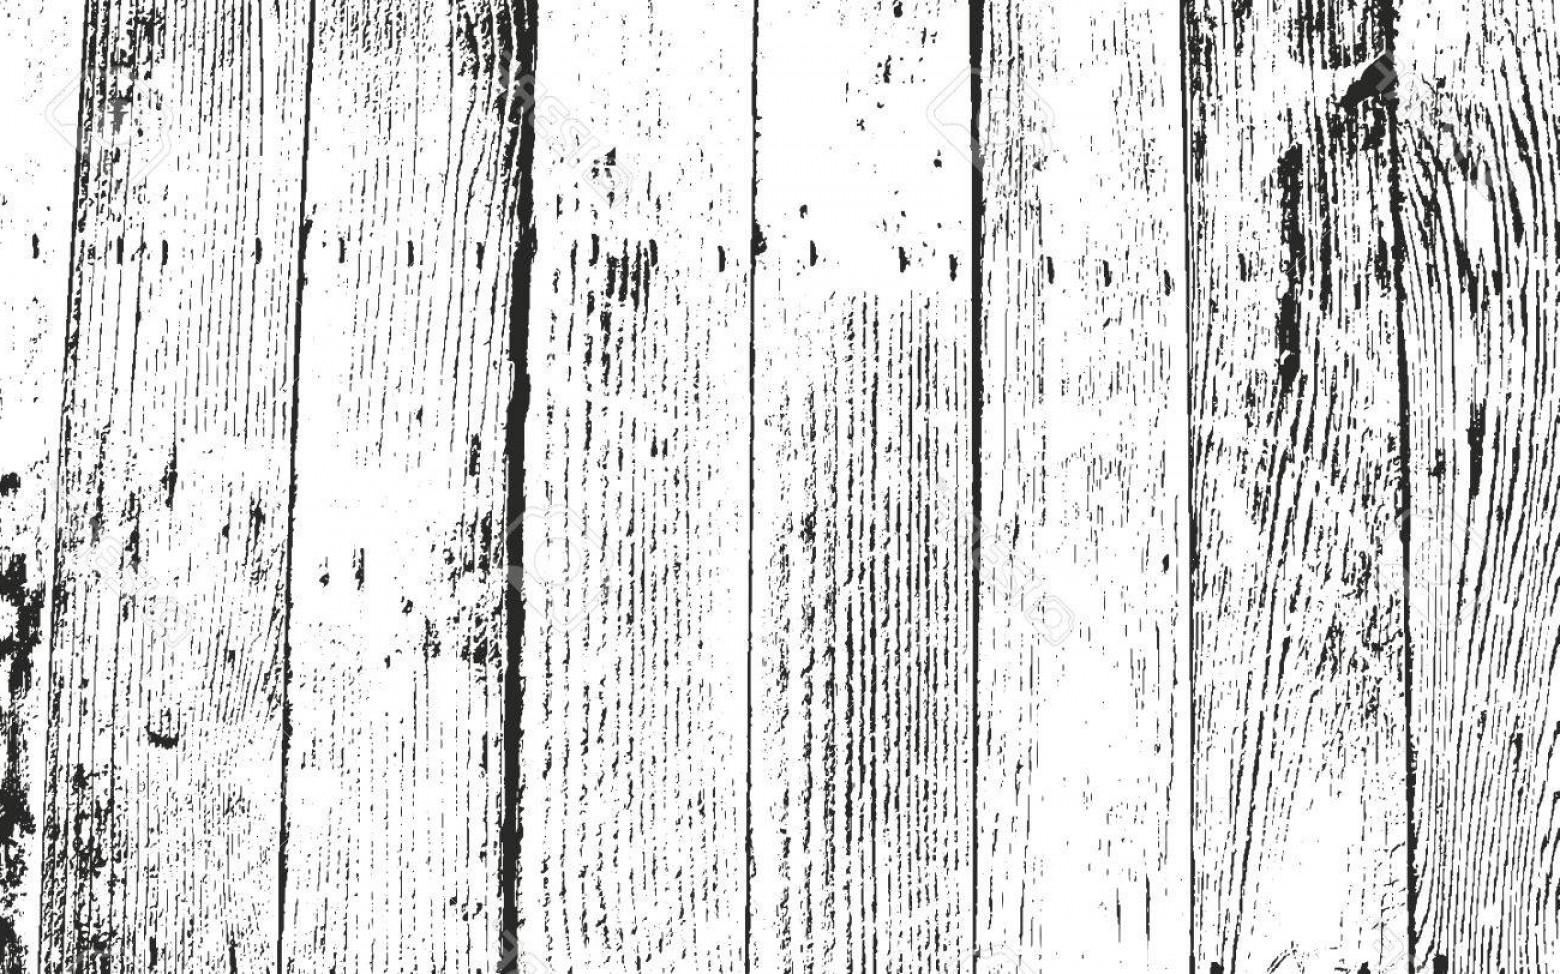 1560x974 Distressed Vector Overlay Pattern Lazttweet